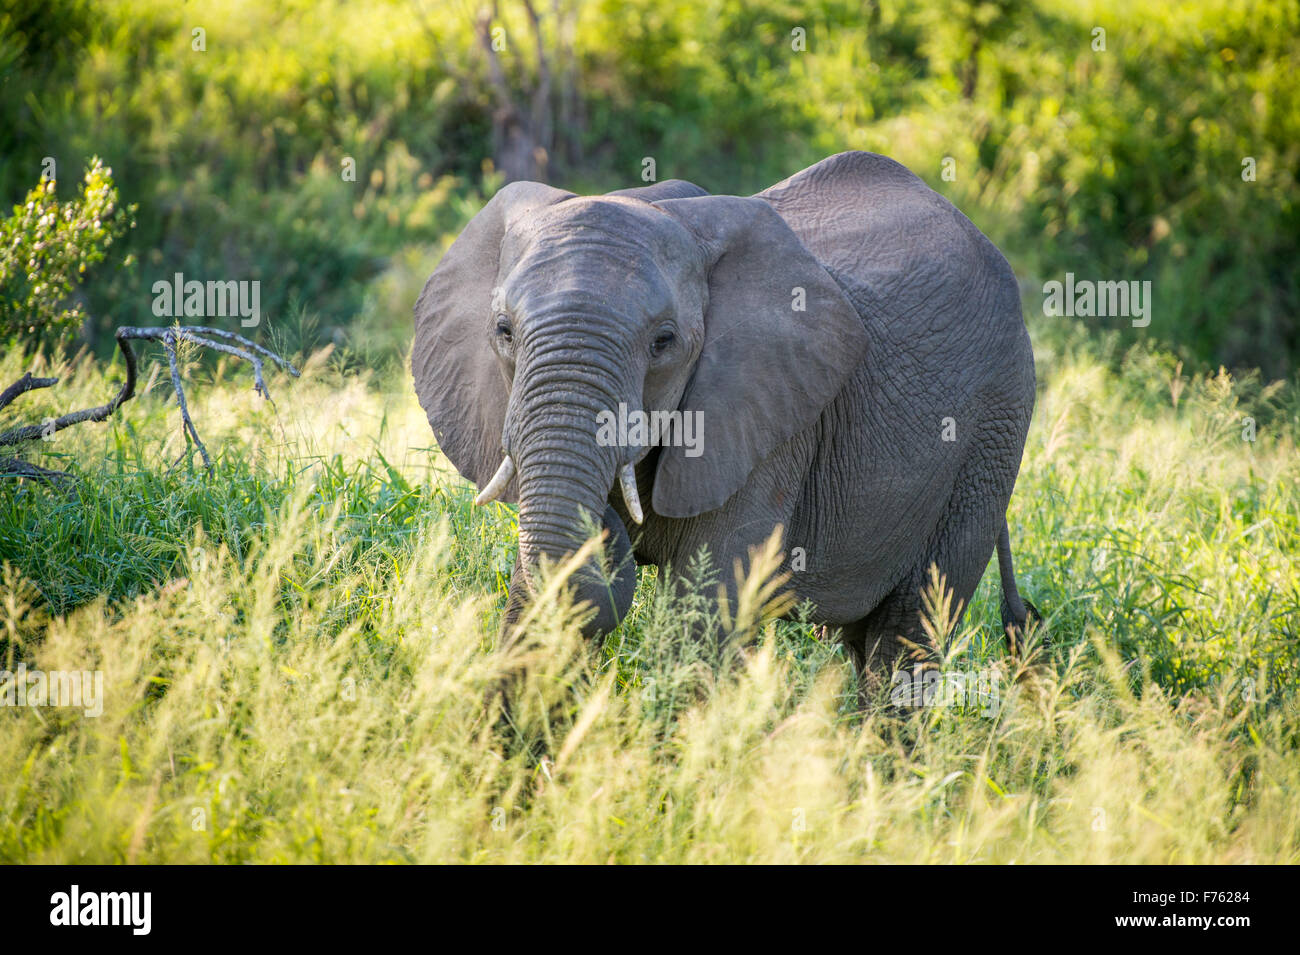 Afrique du Sud - Parc National Kruger African Elephant (Loxodonta) Photo Stock